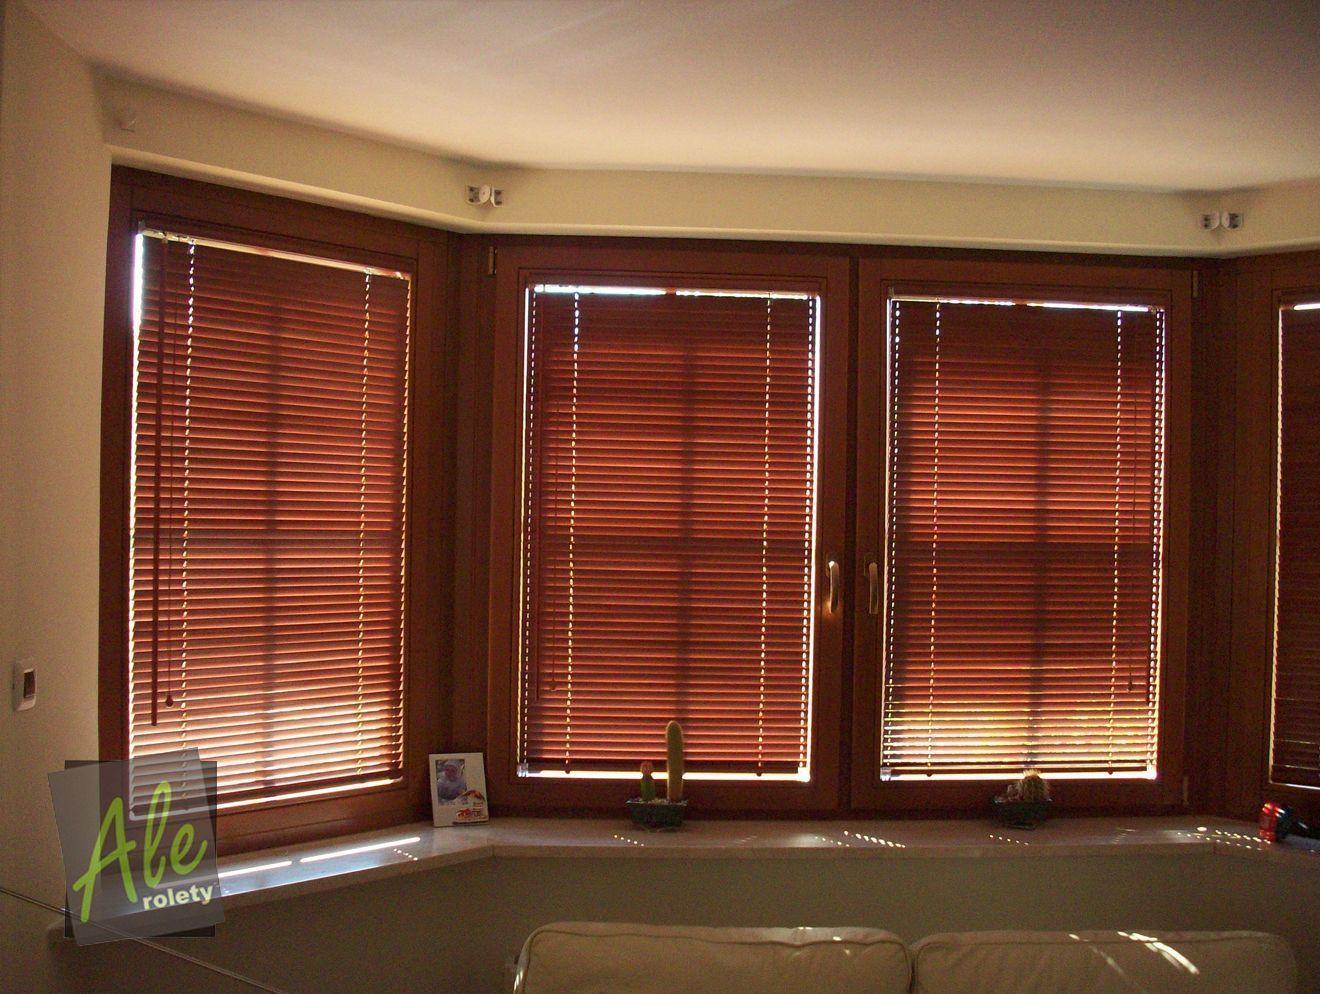 Window blinds ideas  diy blinds ideas diy blinds bamboosheer blinds john lewis bamboo